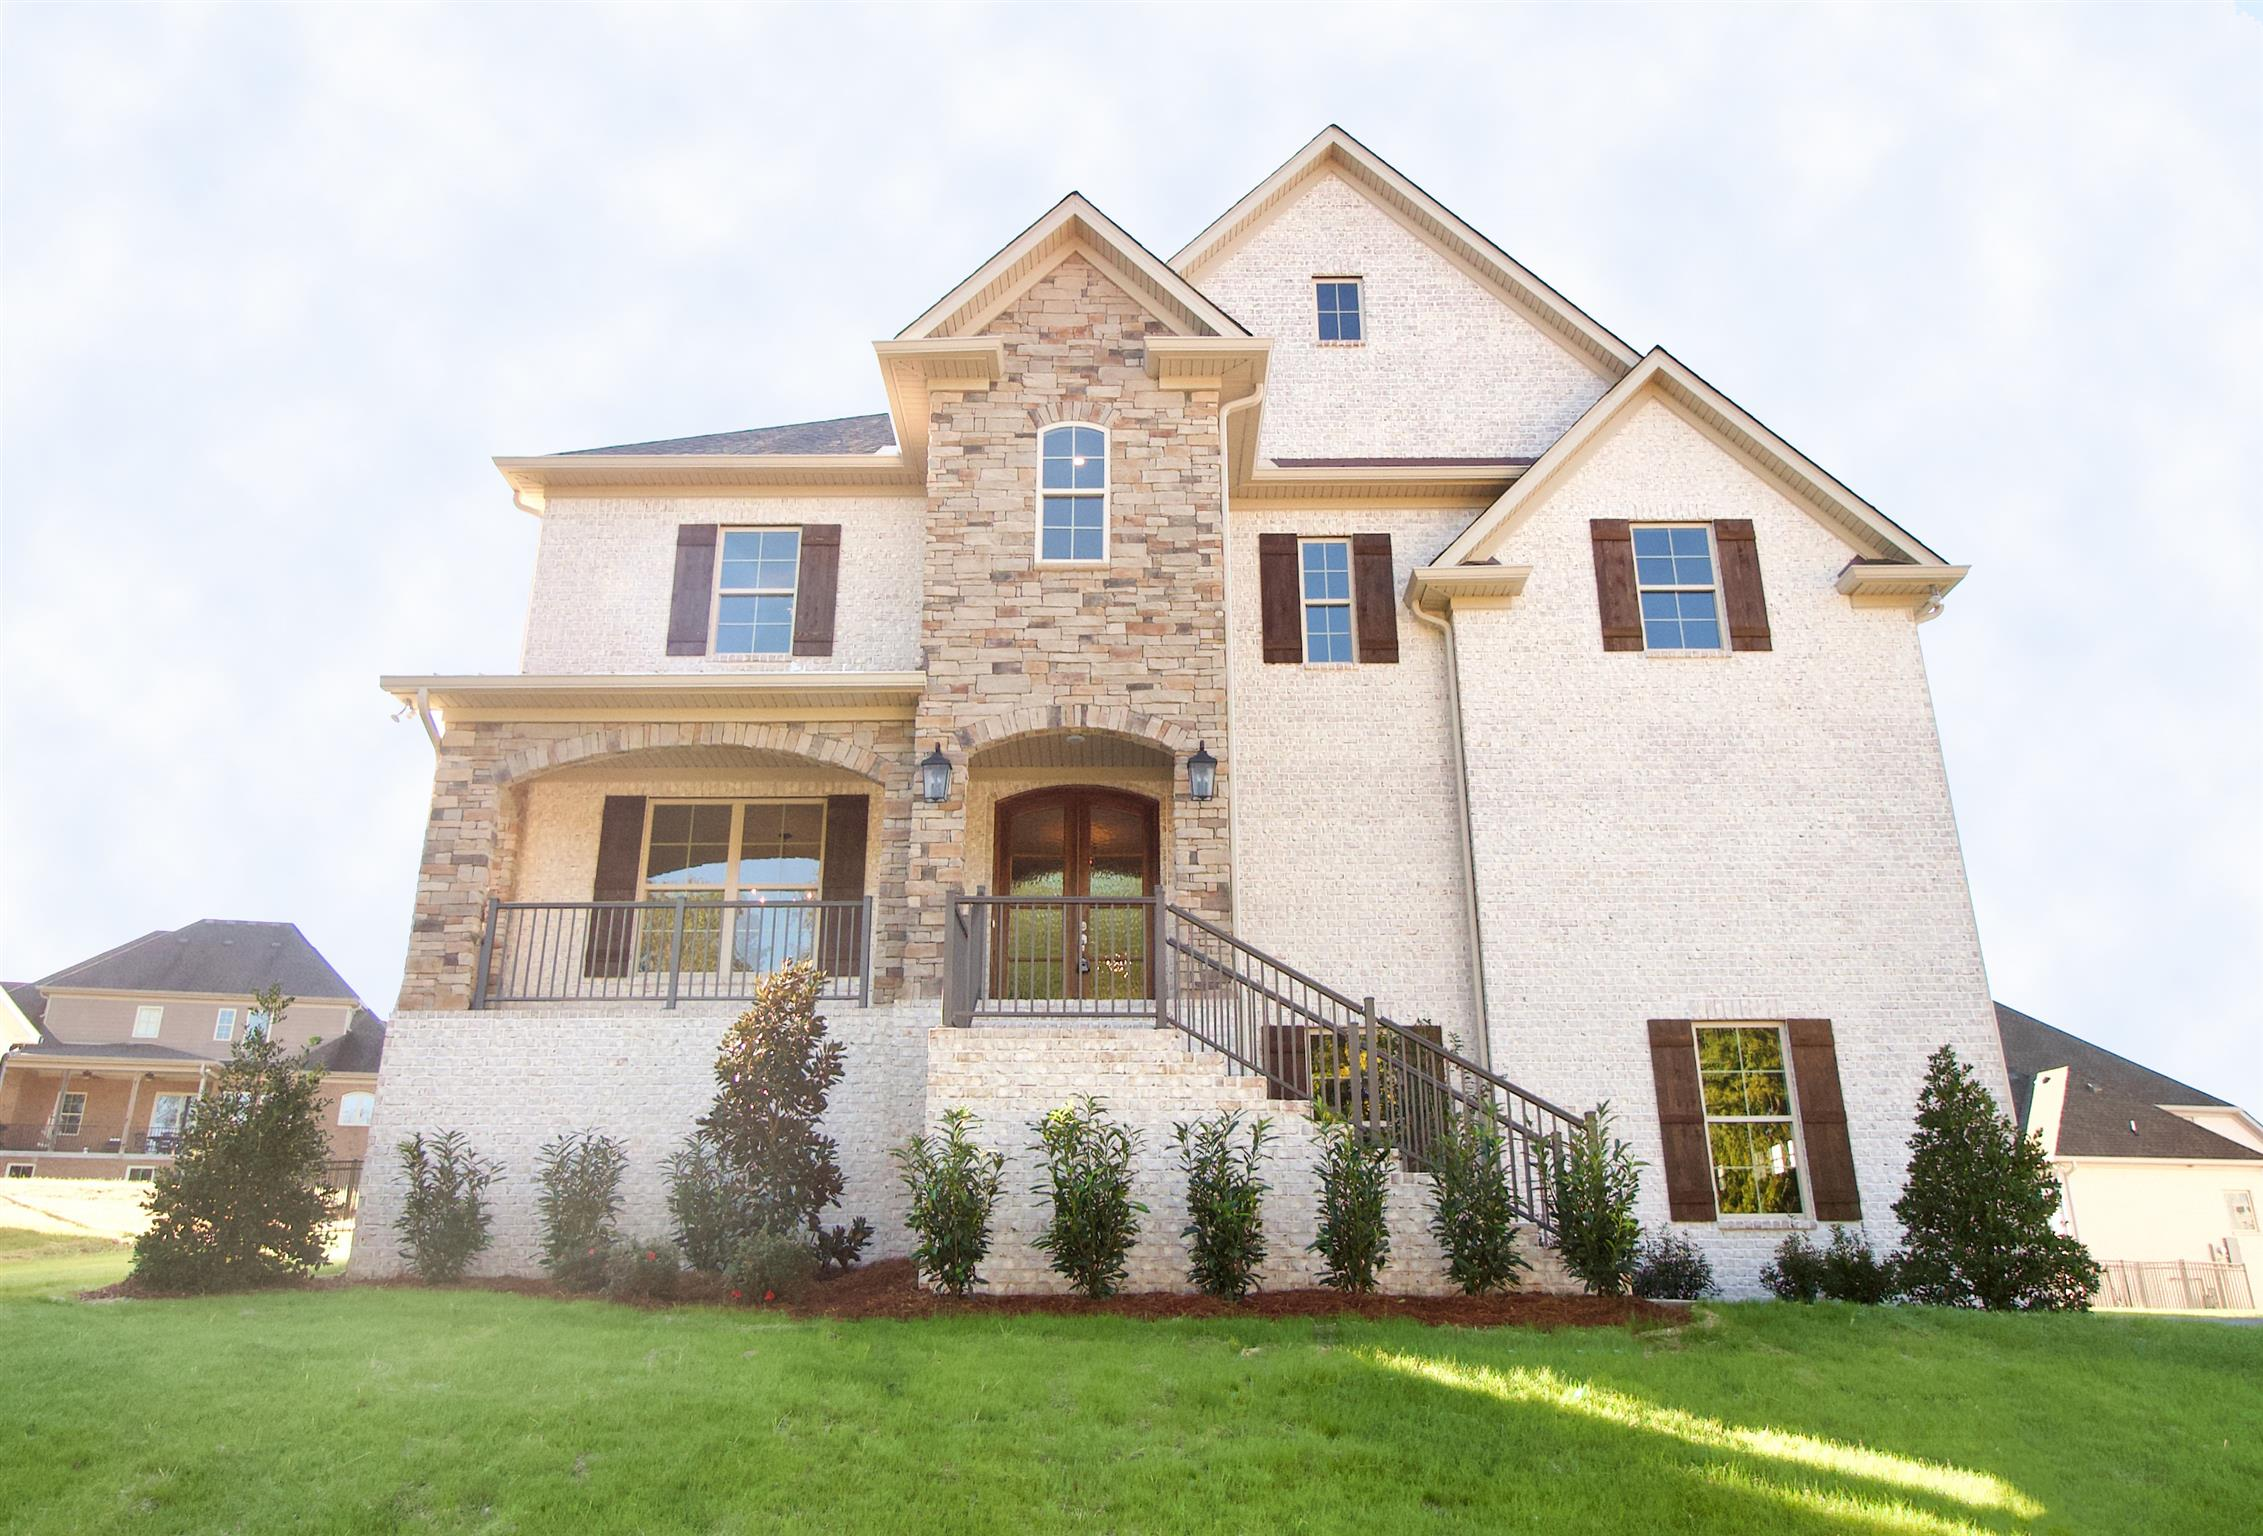 308 Tartan Ct, Hendersonville, TN 37075 - Hendersonville, TN real estate listing